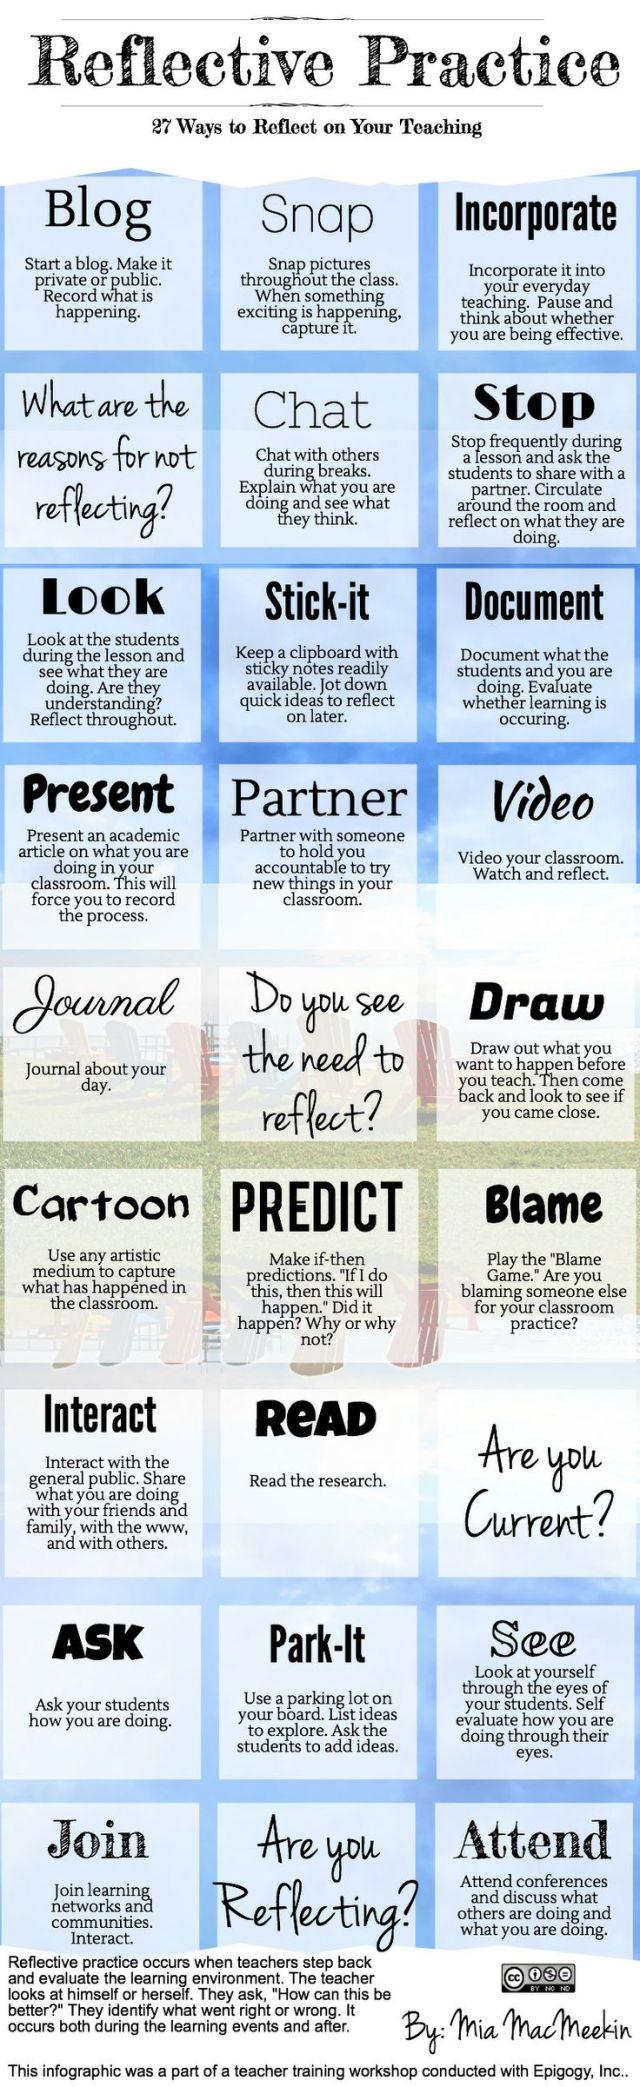 reflective-practice infographic